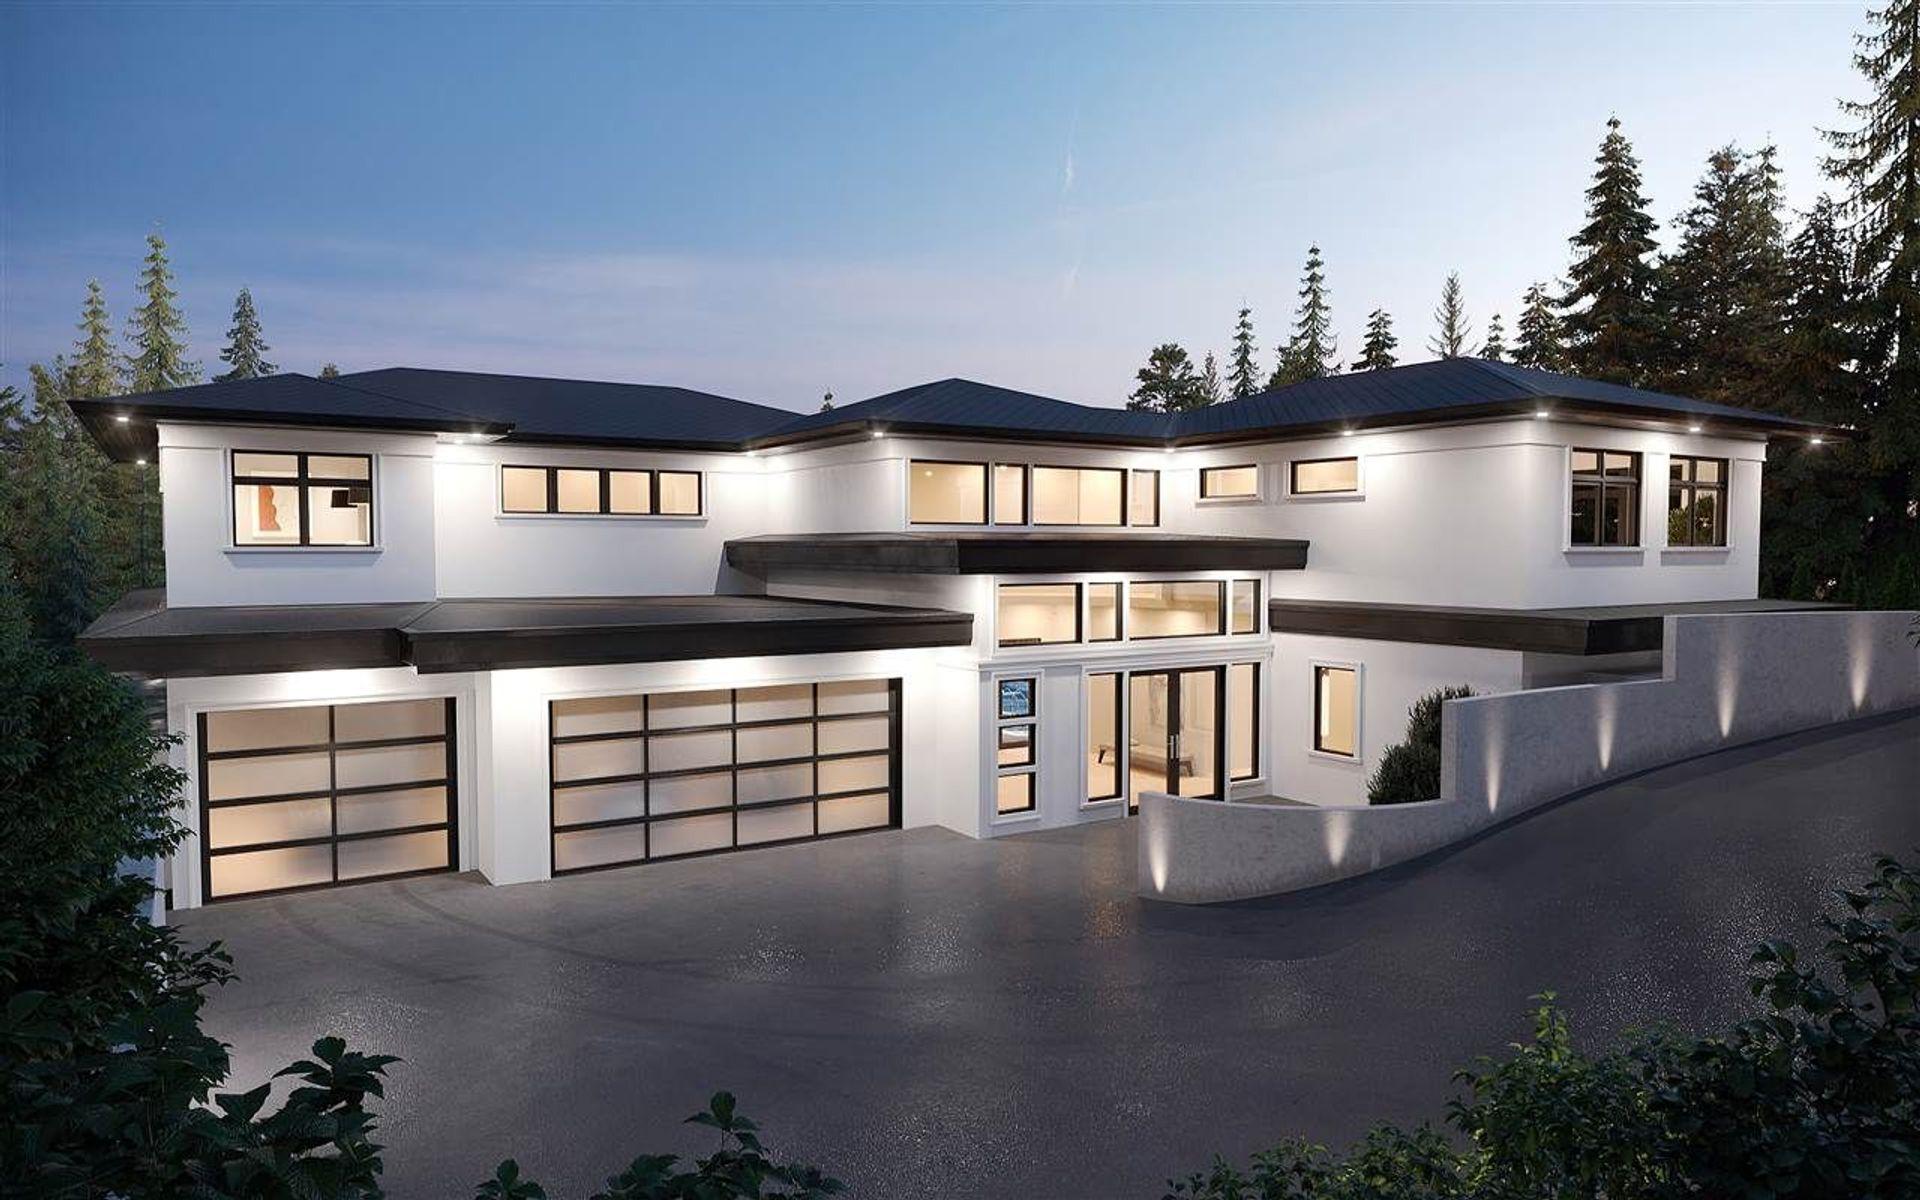 360-southborough-drive-british-properties-west-vancouver-02 at 360 Southborough Drive, British Properties, West Vancouver